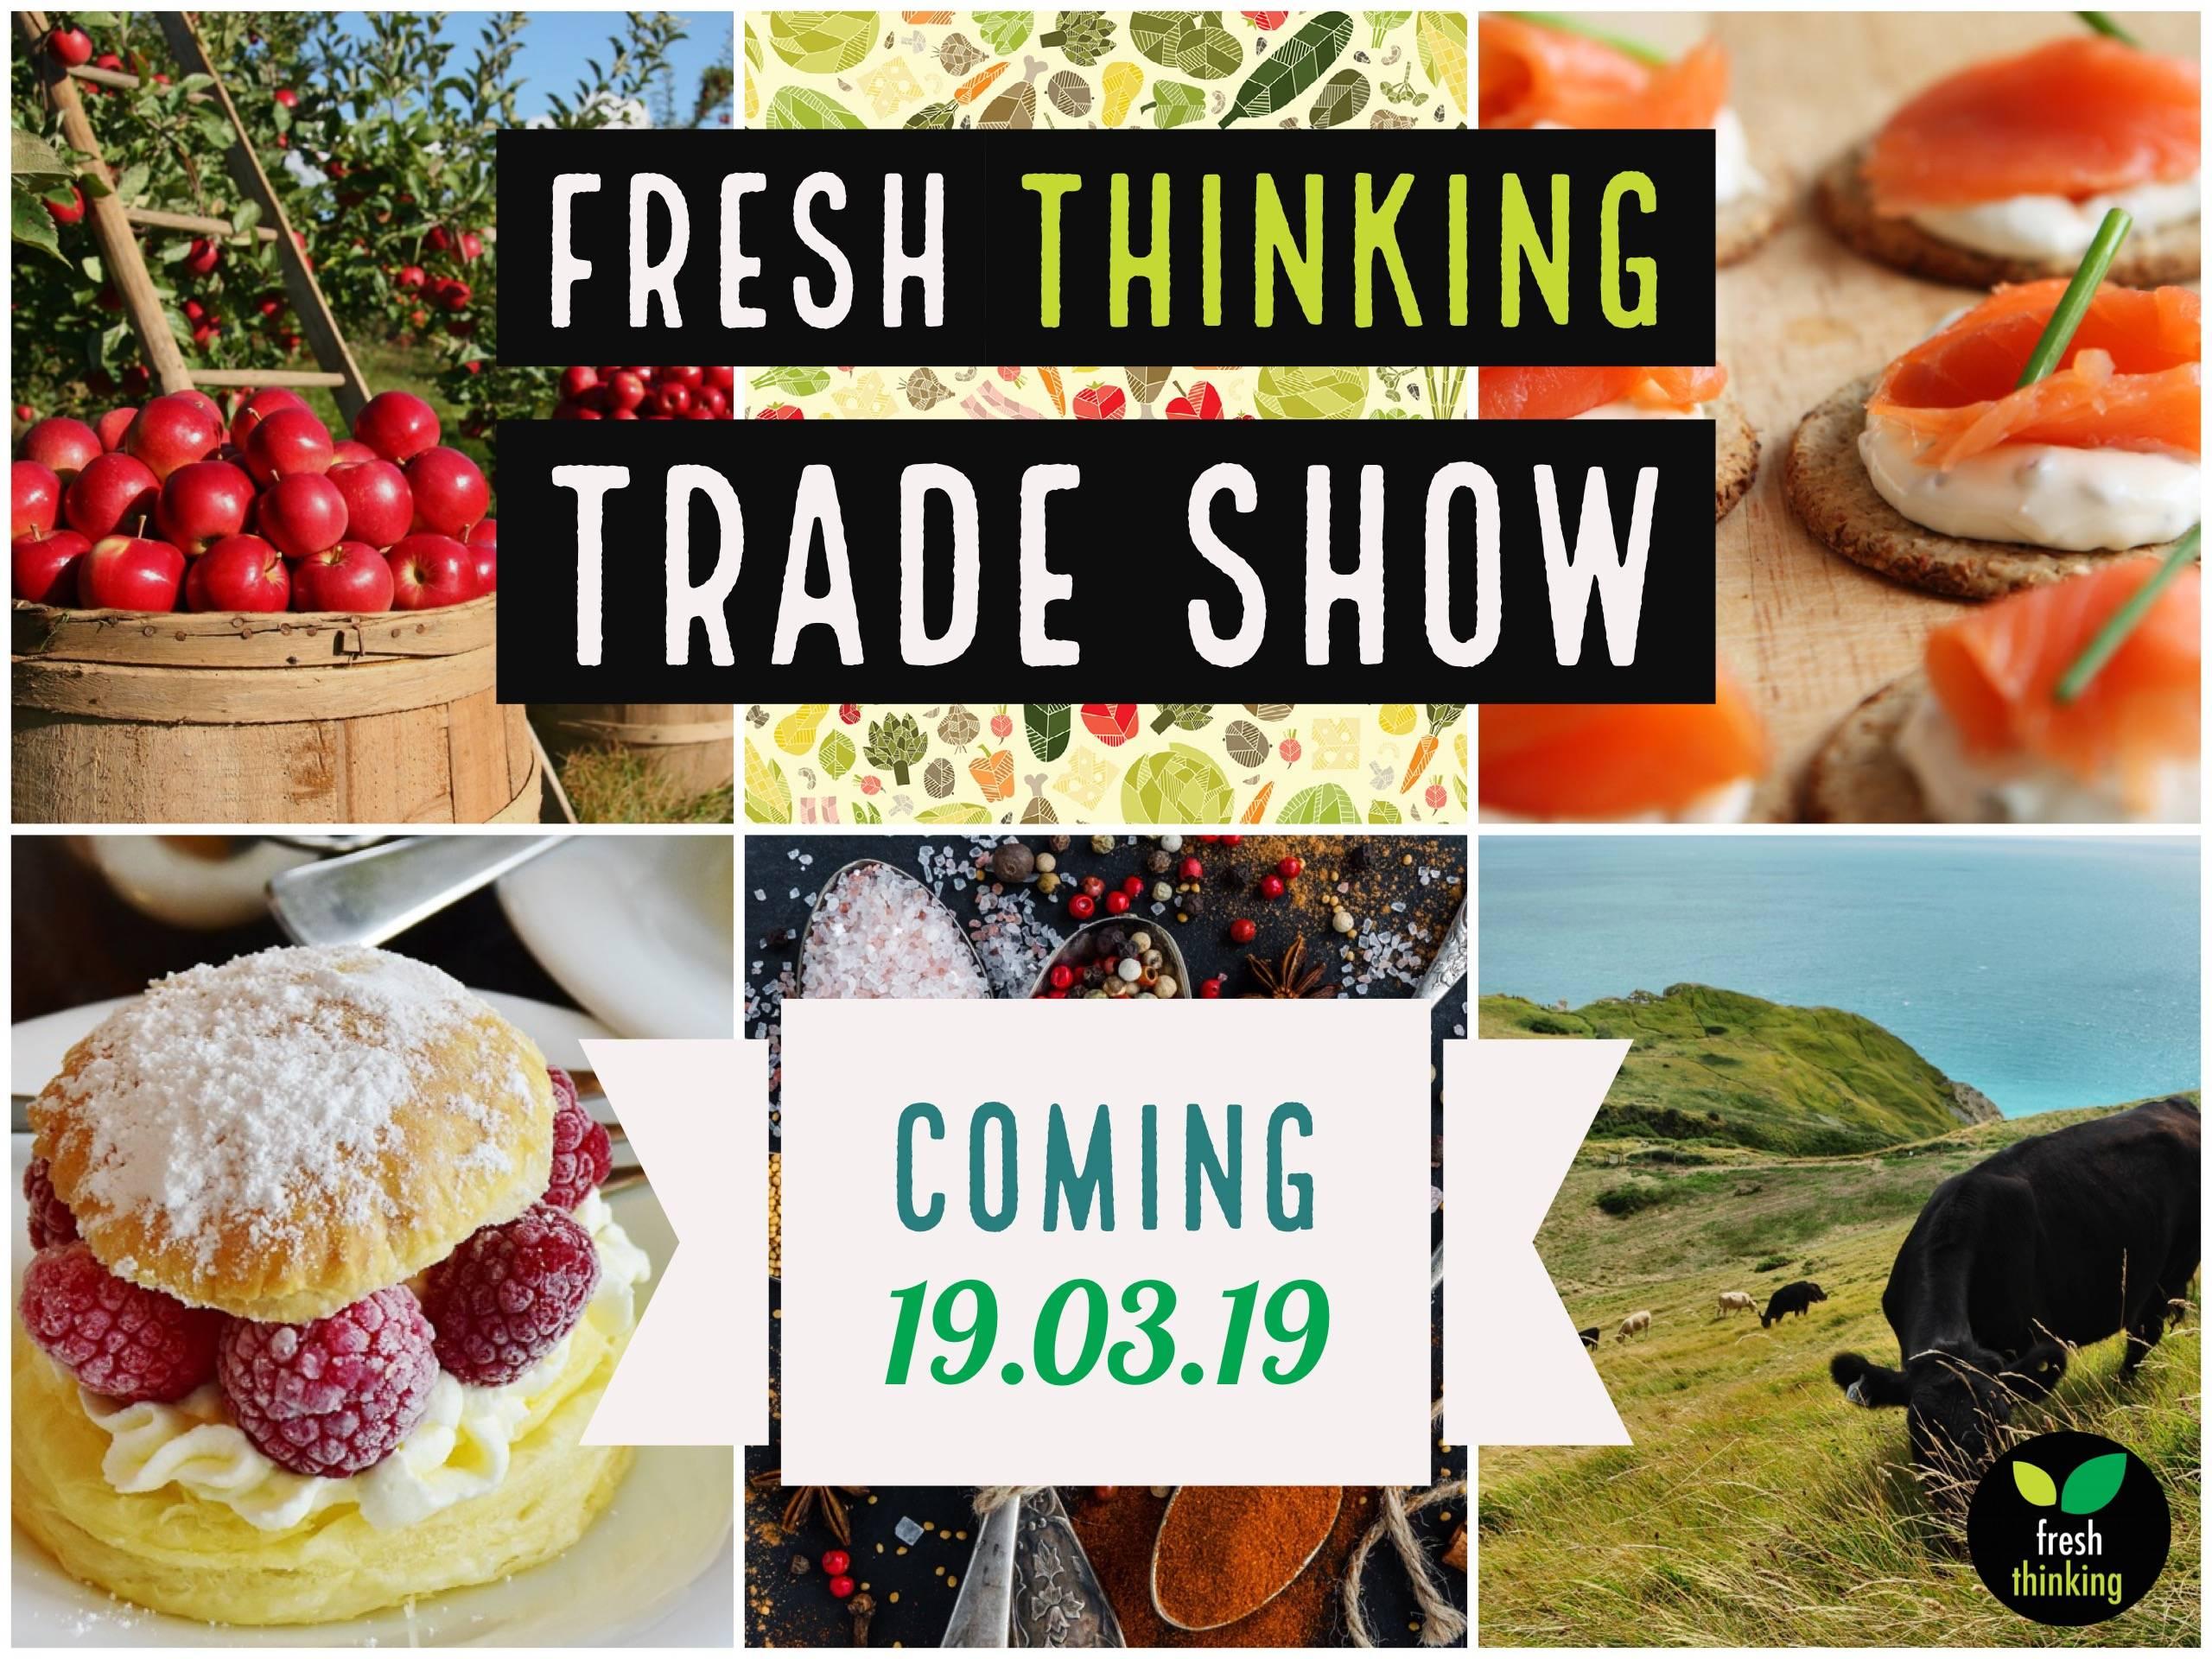 Fresh Thinking Trade Show 2019